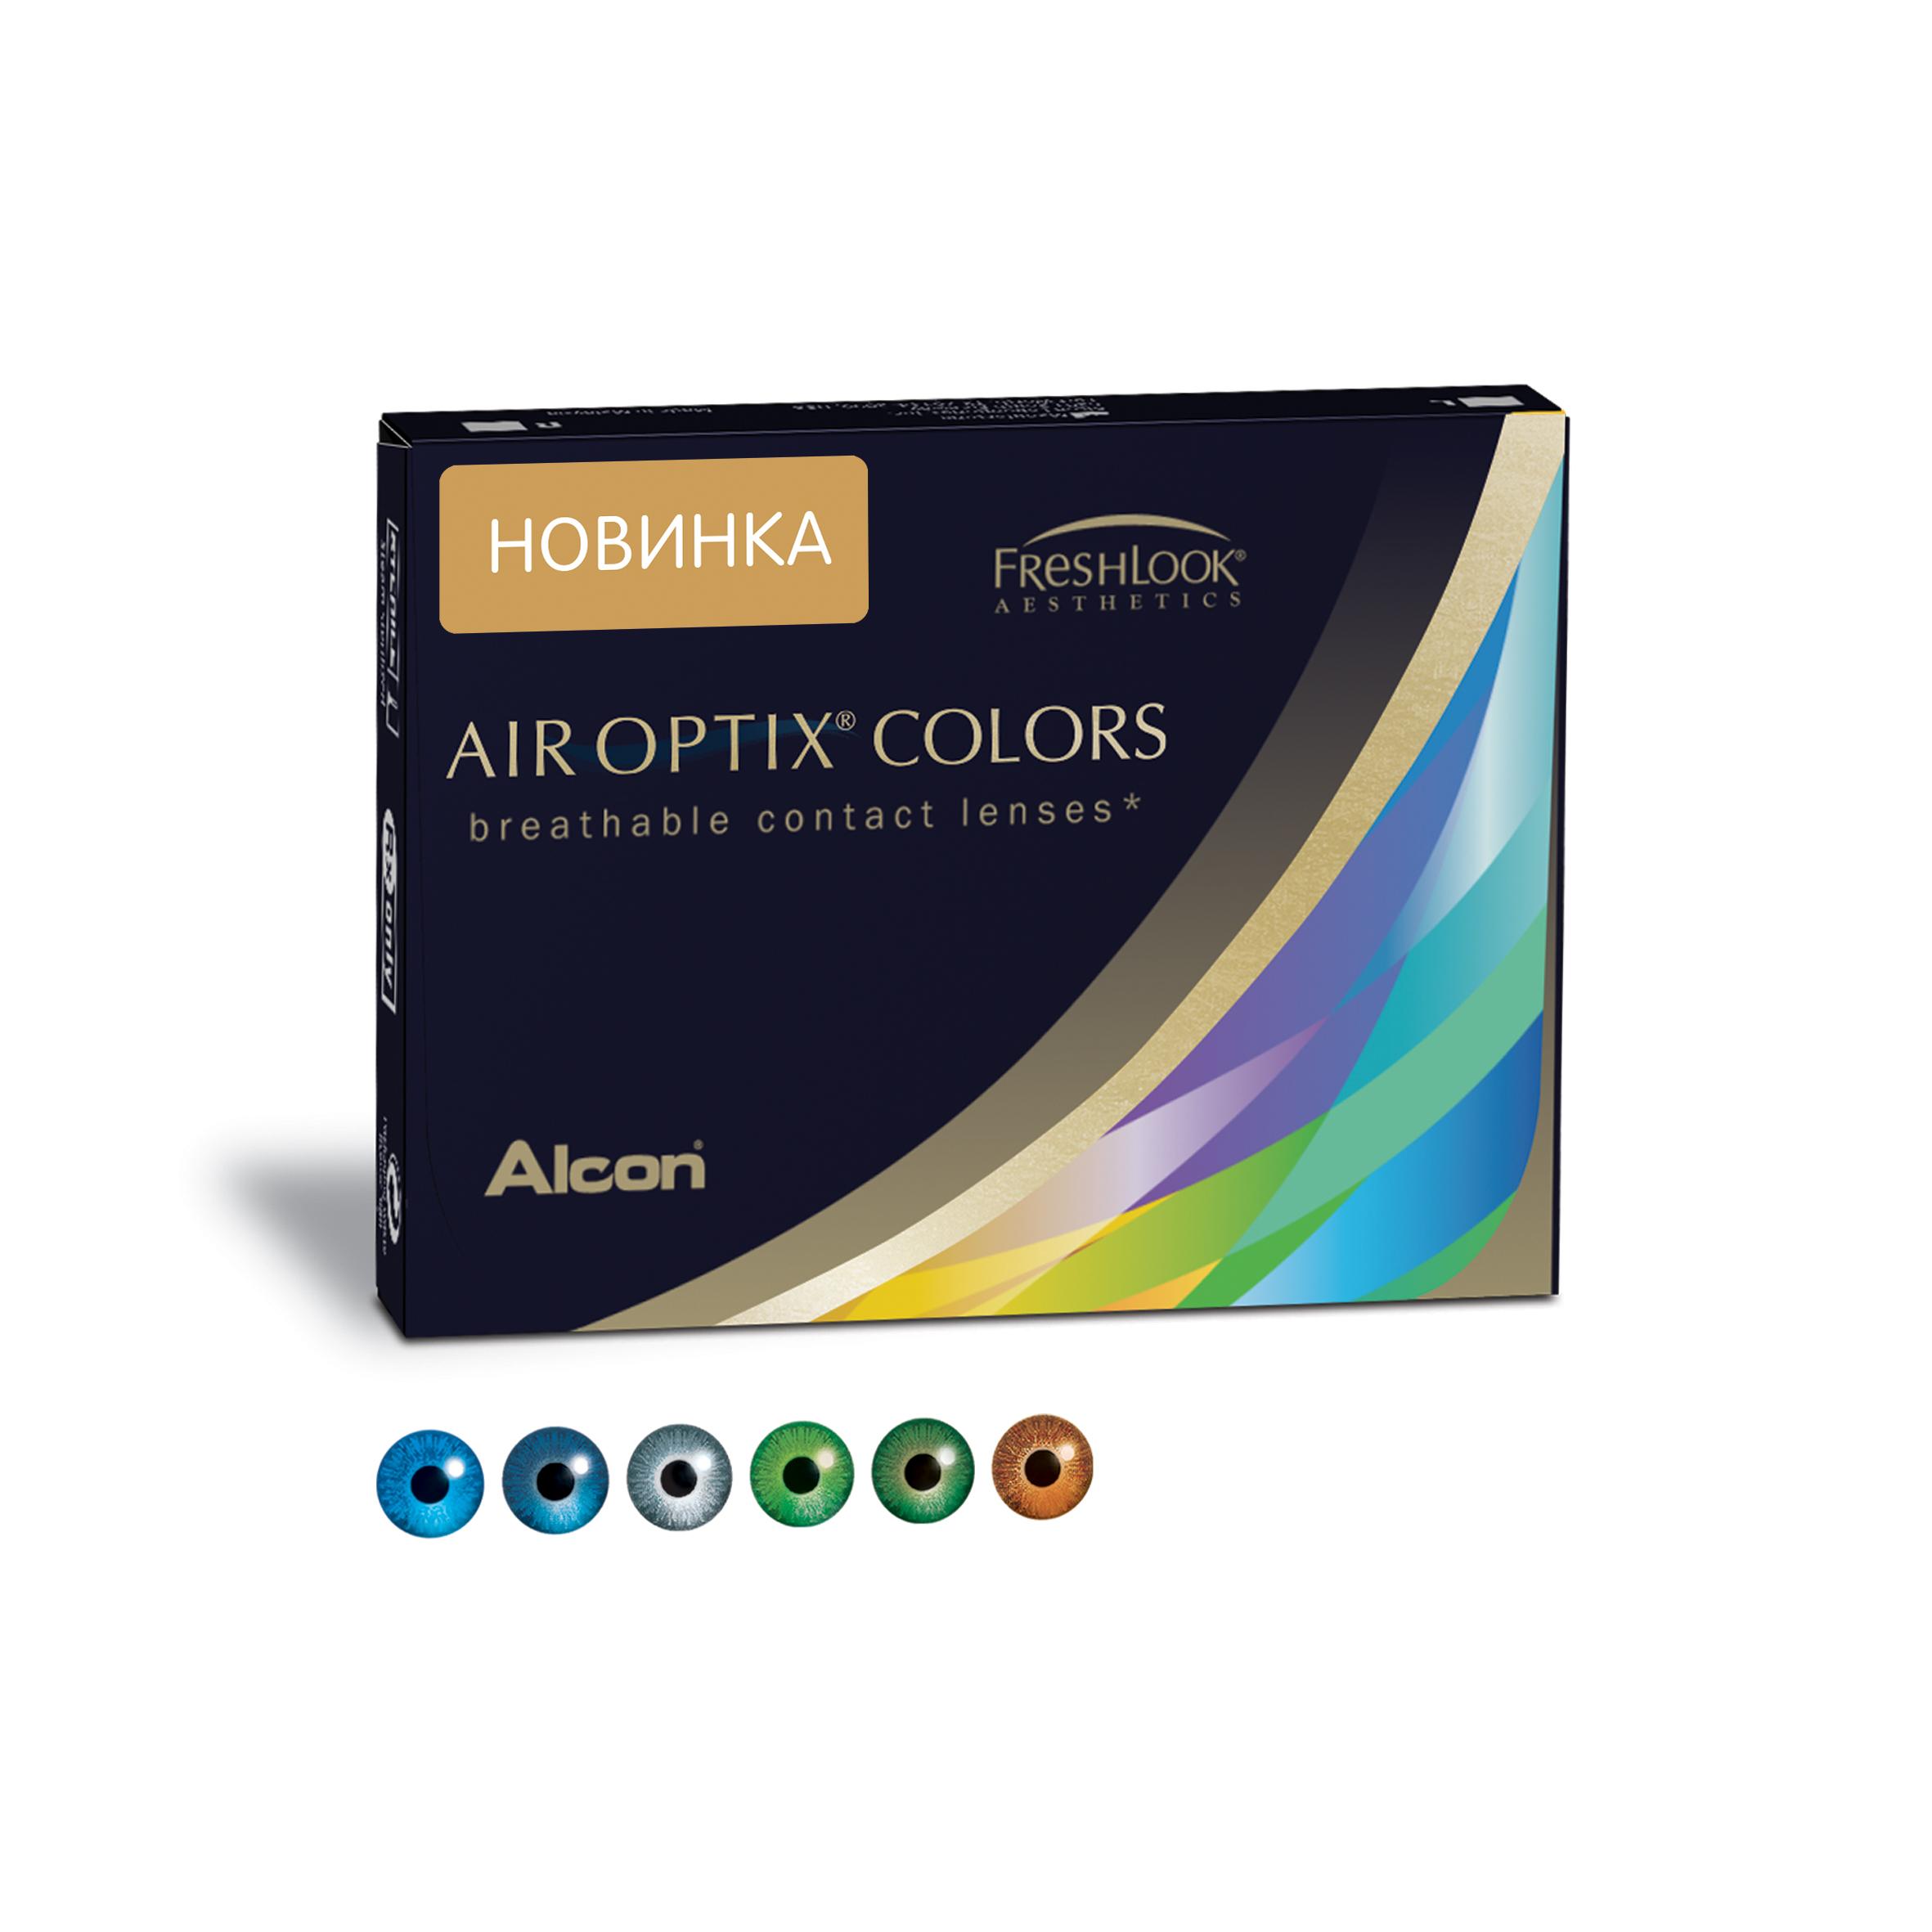 Аlcon контактные линзы Air Optix Colors 2 шт -2.25 Brilliant Blue31746167Мягкие контактные линзы